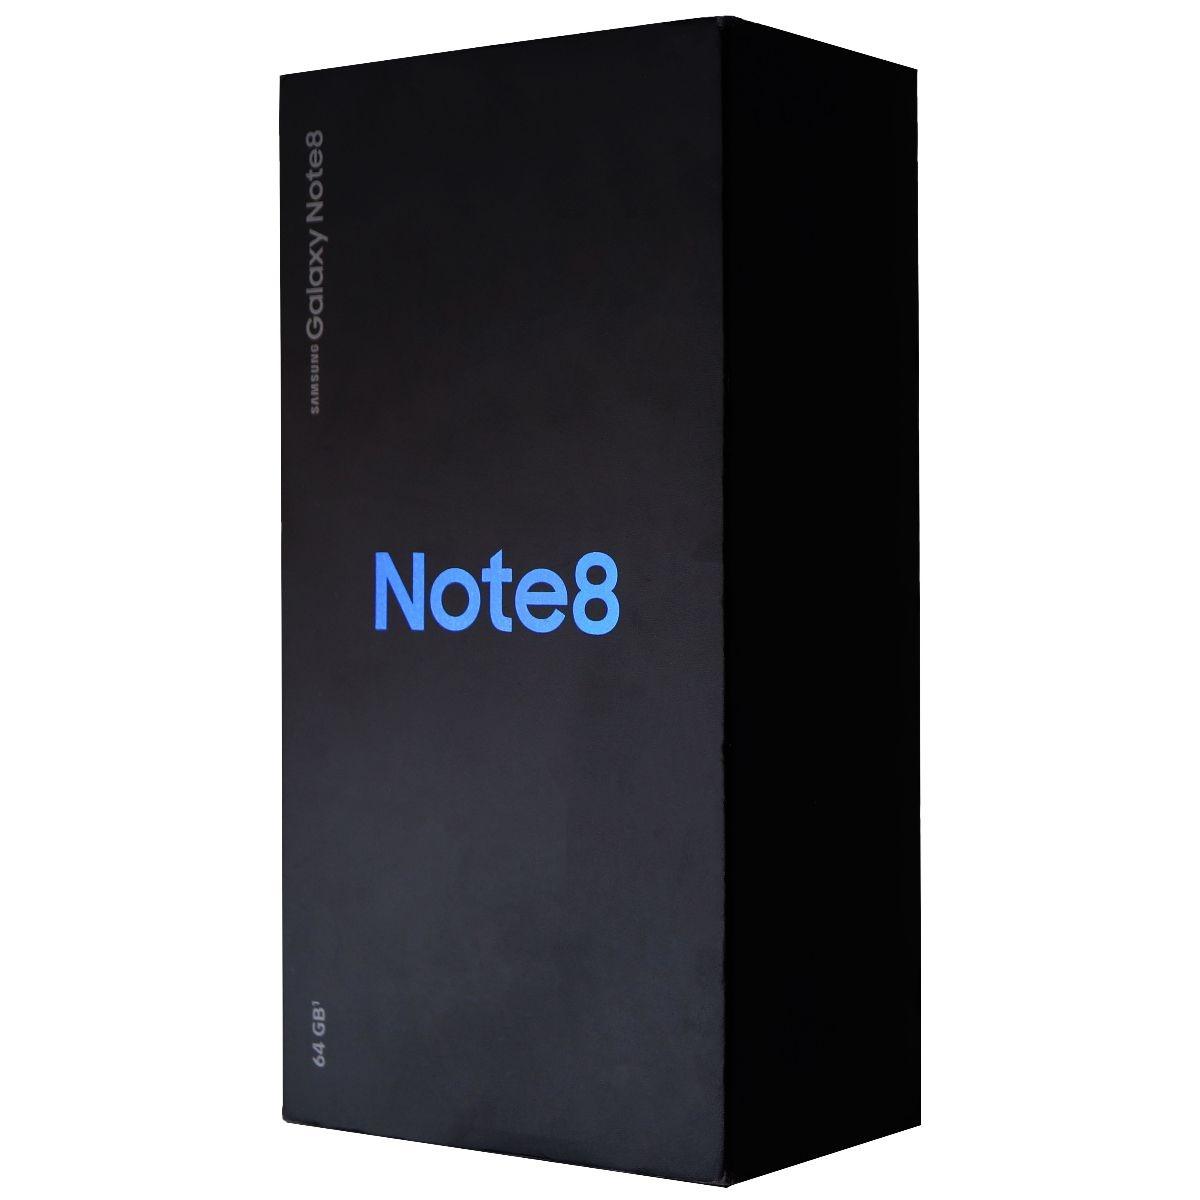 RETAIL BOX - Samsung Galaxy Note 8 - 64GB Midnight Black  - NO DEVICE